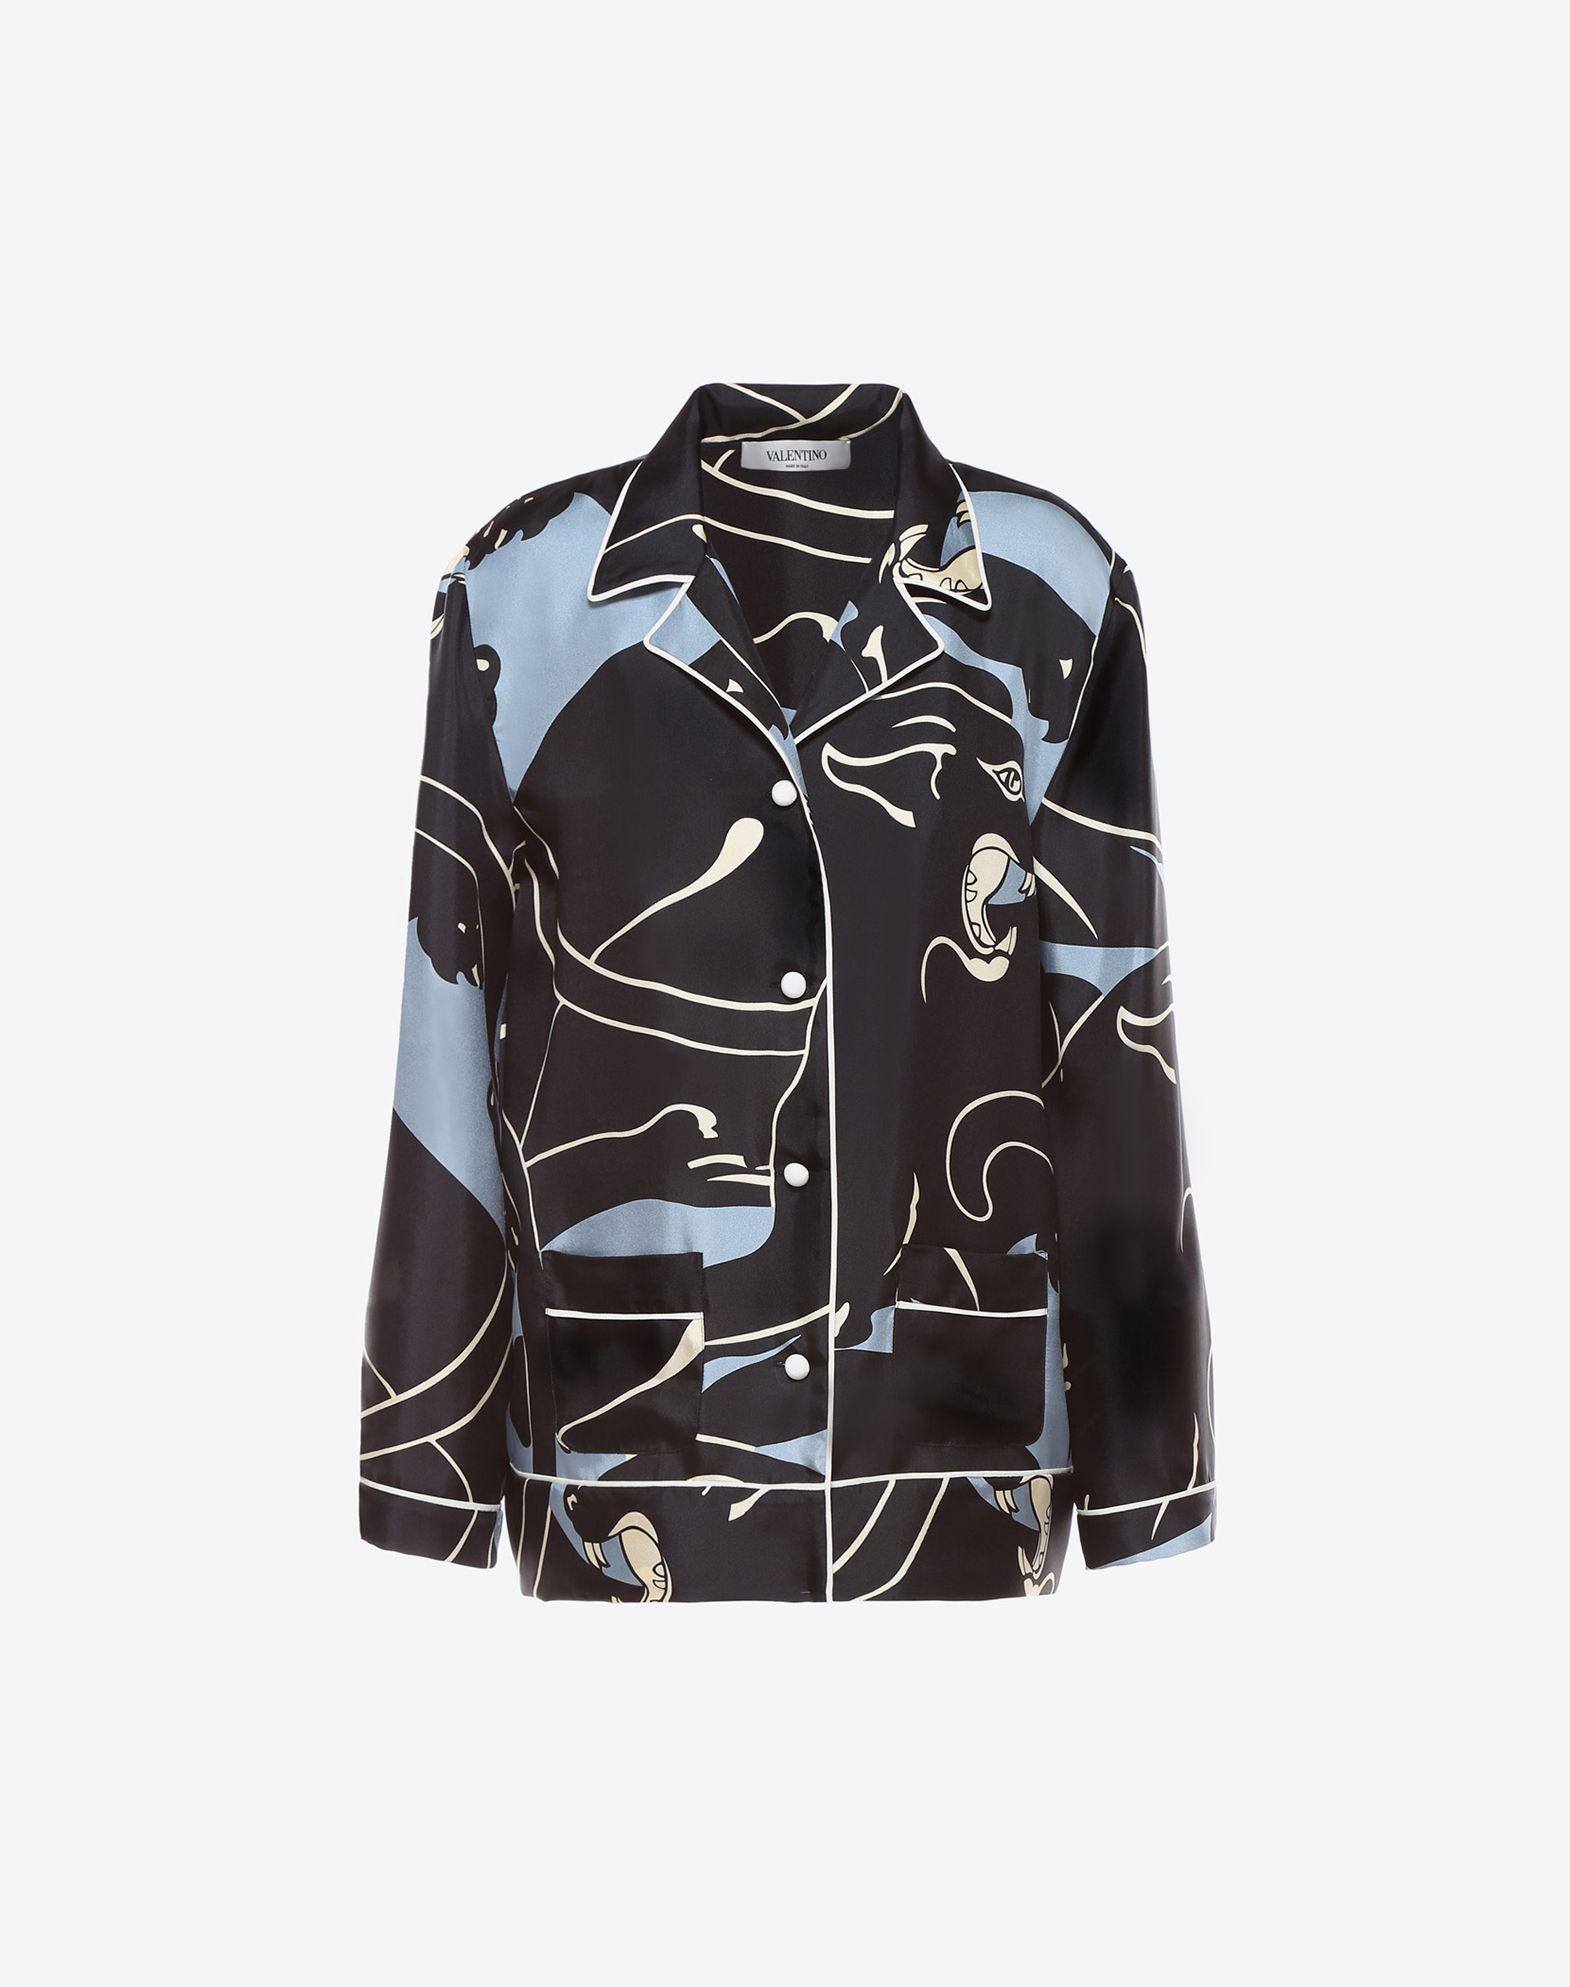 VALENTINO Button closing Satin Lapel collar Two pockets Long sleeves  12035359dc